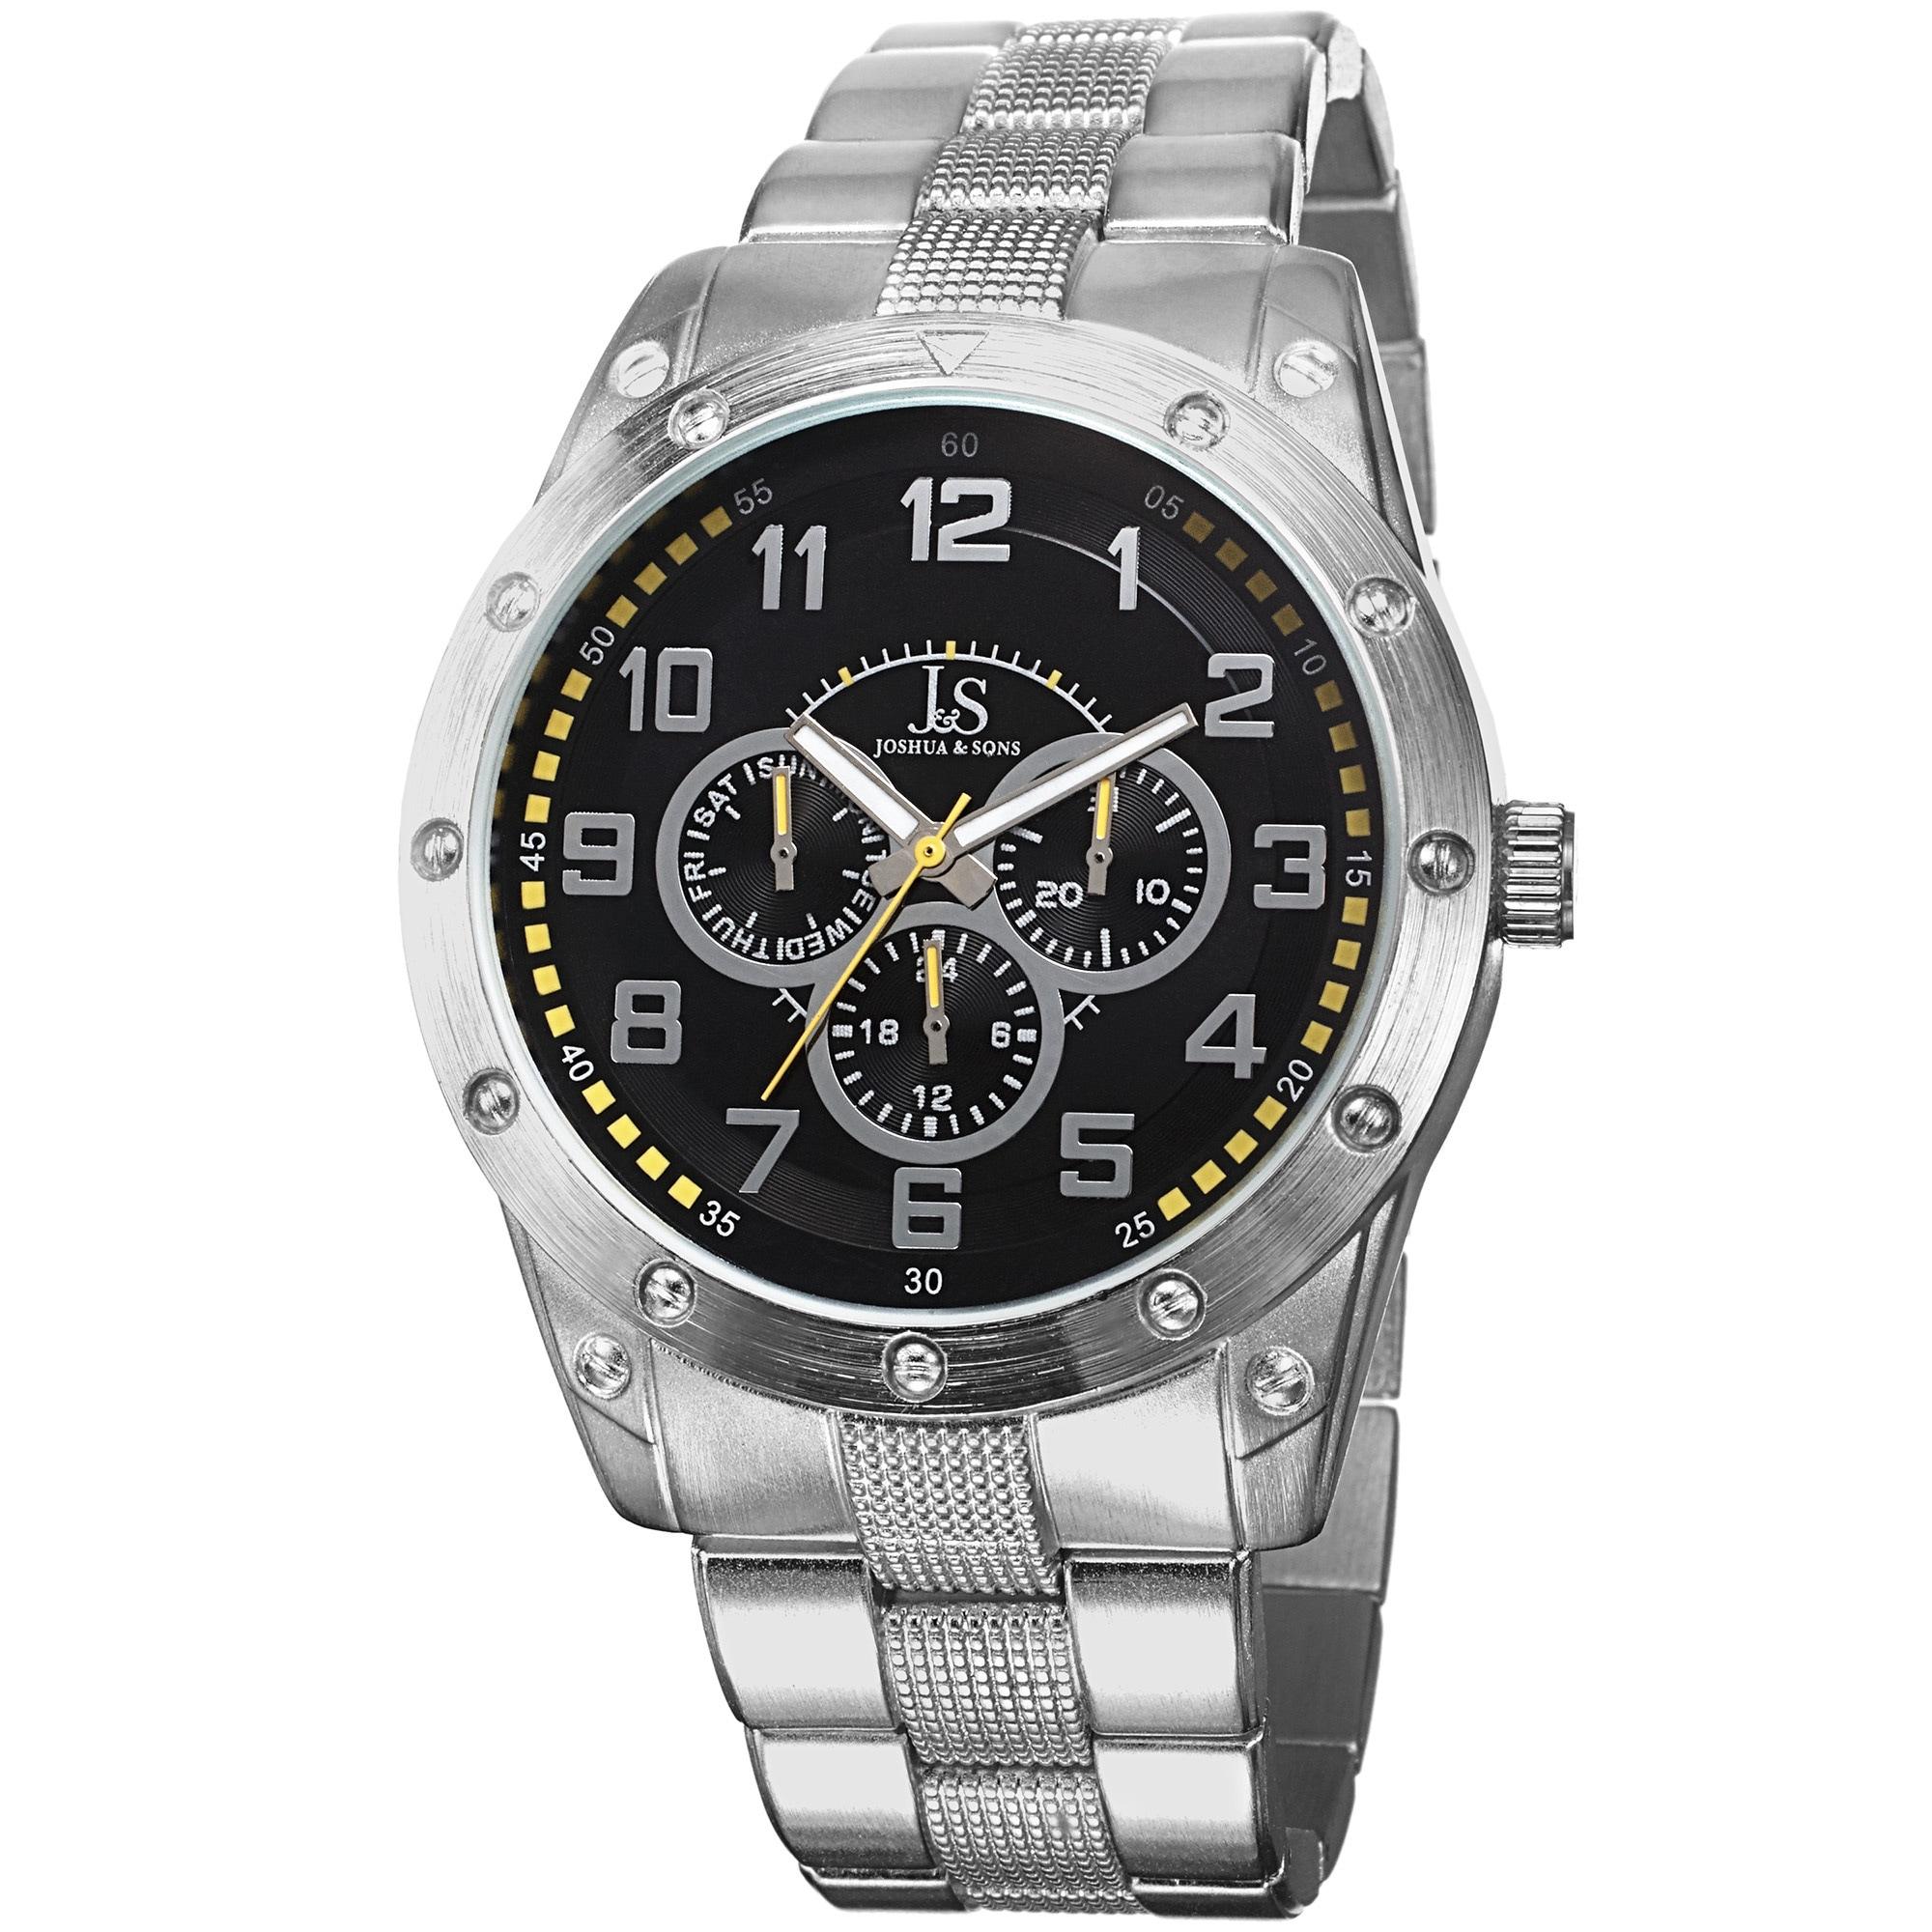 J&S Men's Multifunction Sunray Dial Bracelet Watch (Yello...